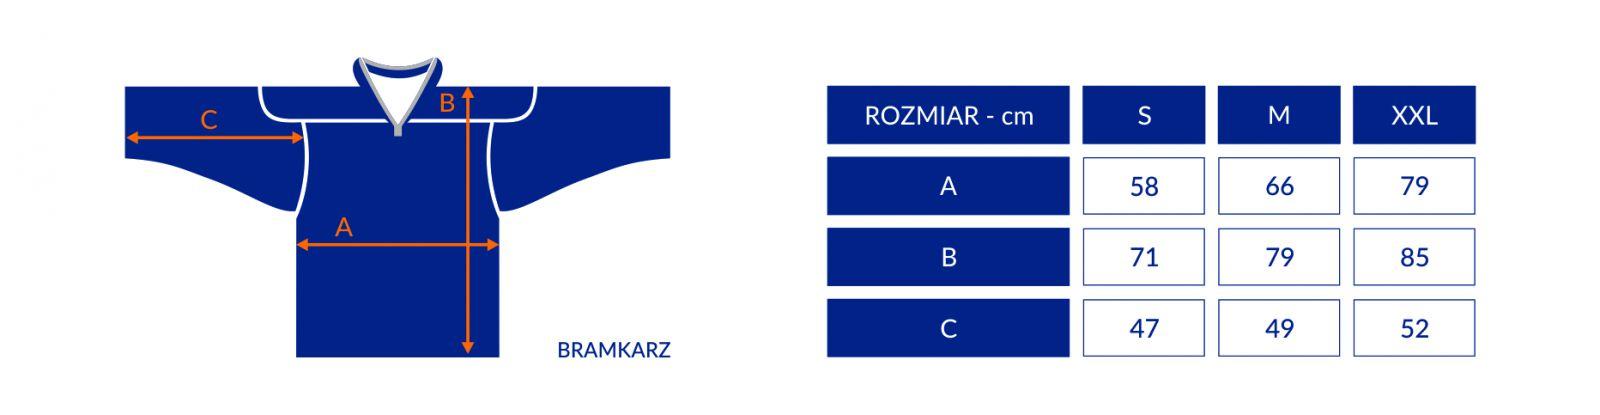 a025db799 Koszulka bramkarska Sportrebel Sr | Dodatki | Sklep hokejowy Sportrebel